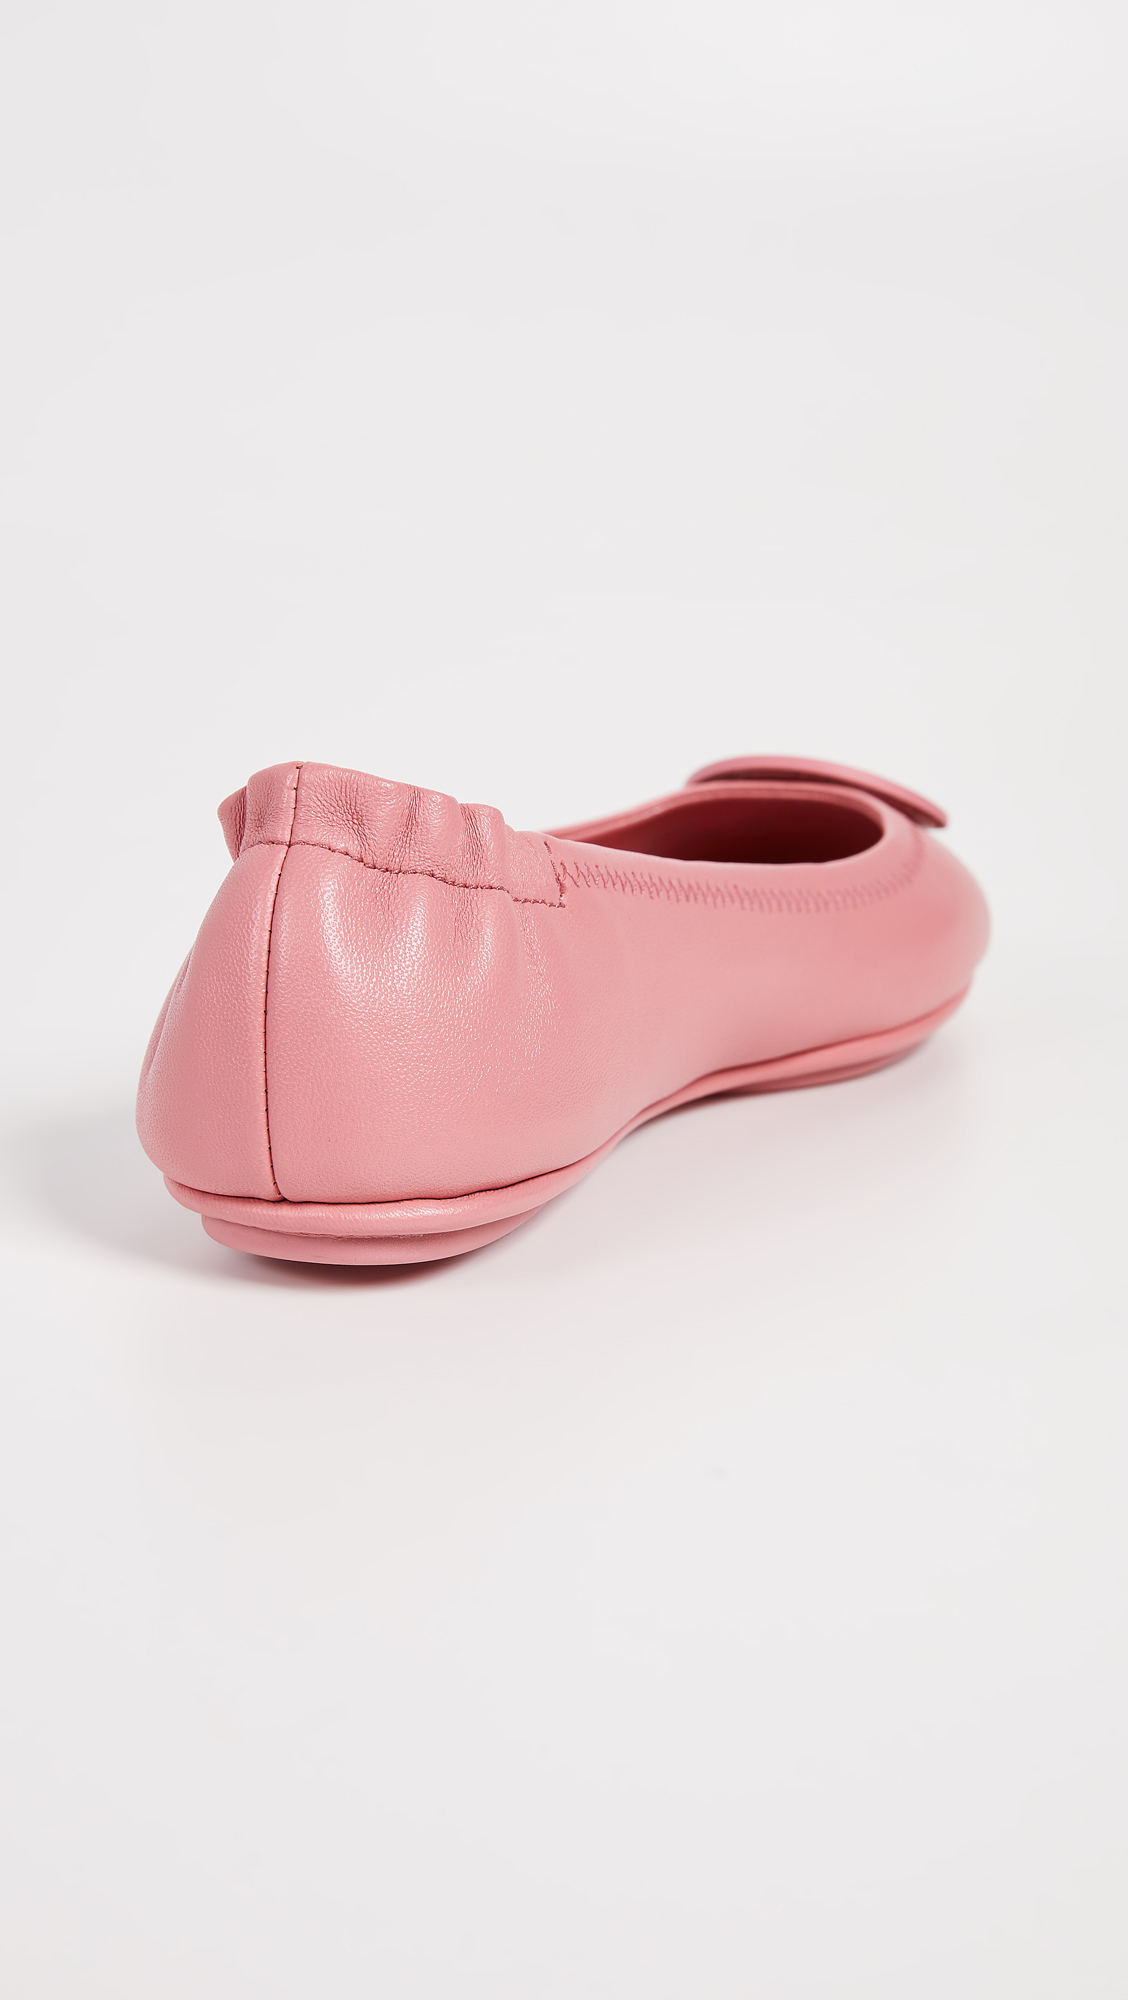 1b2fcb8d31cf Tory Burch Minnie Ballet Flats